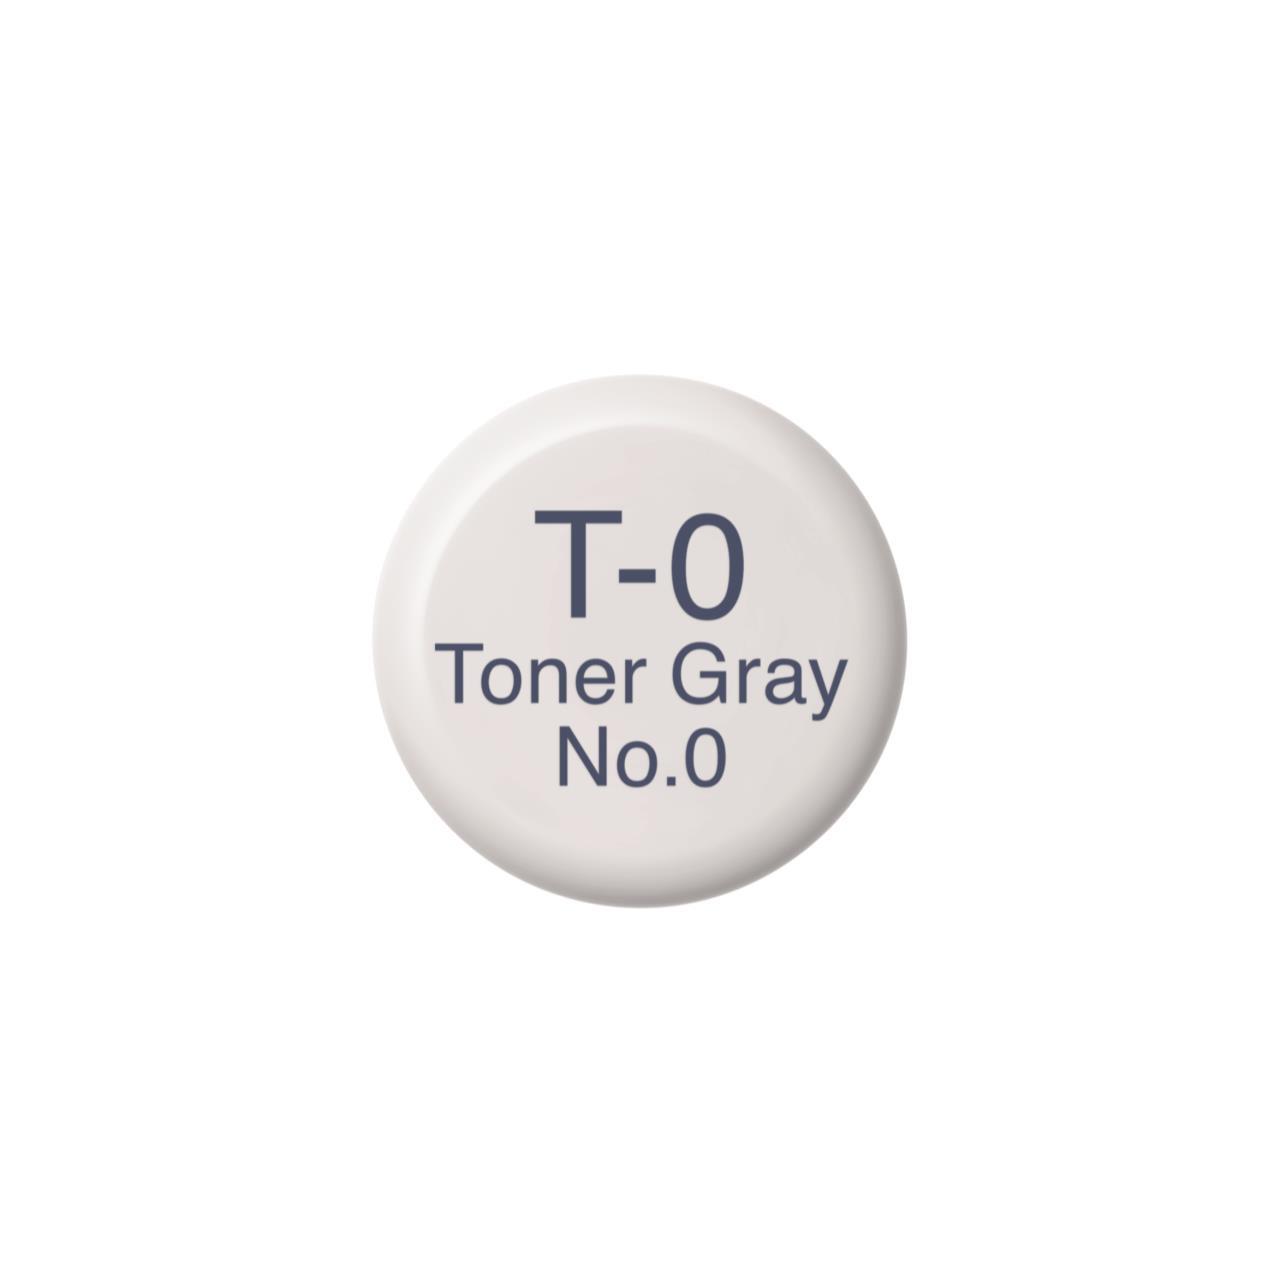 T0 Toner Gray 0, Copic Ink - 4511338055540